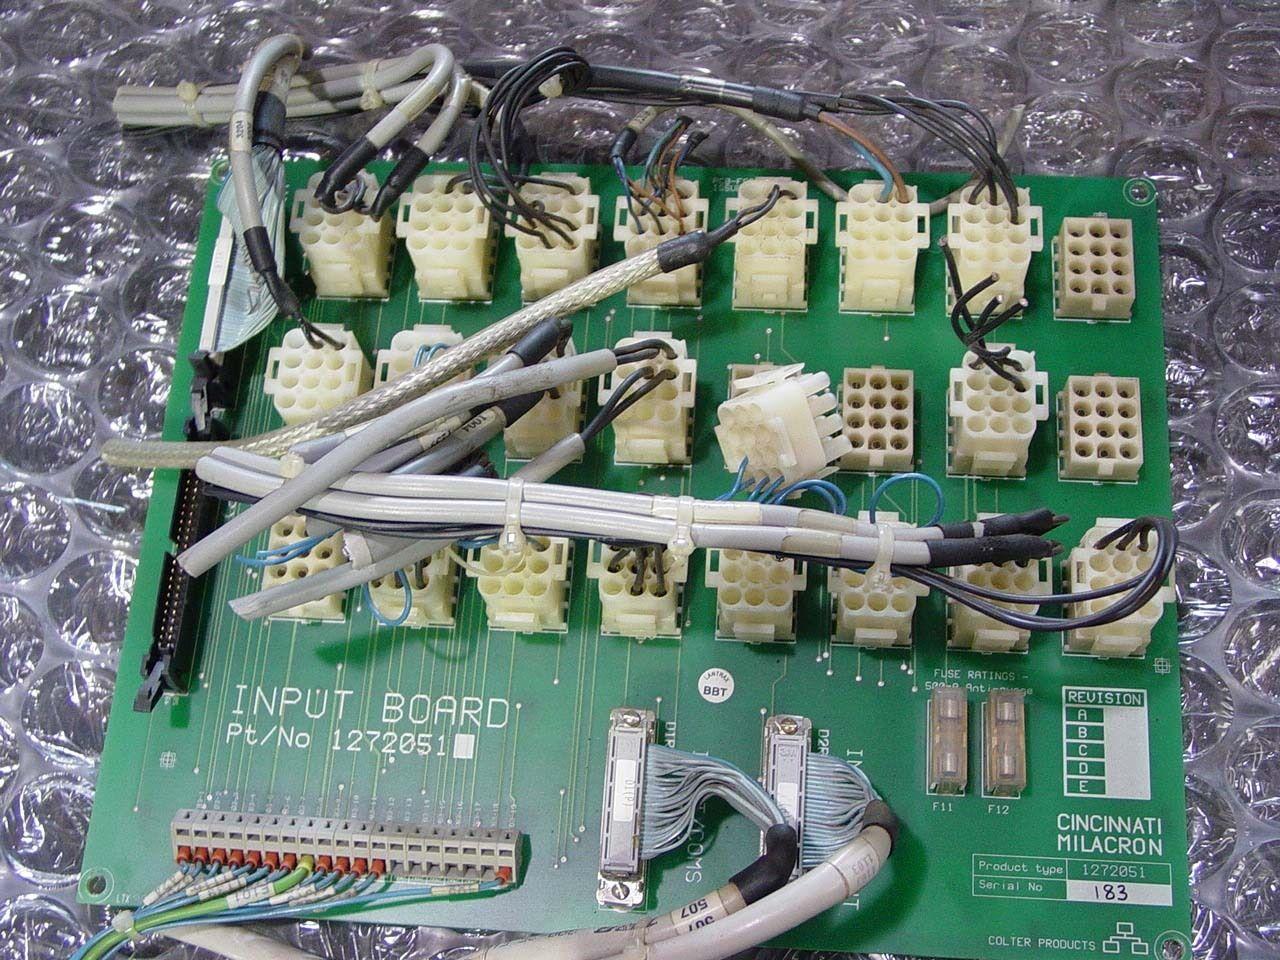 Acramatic 2100 Control Input Board, 1272051